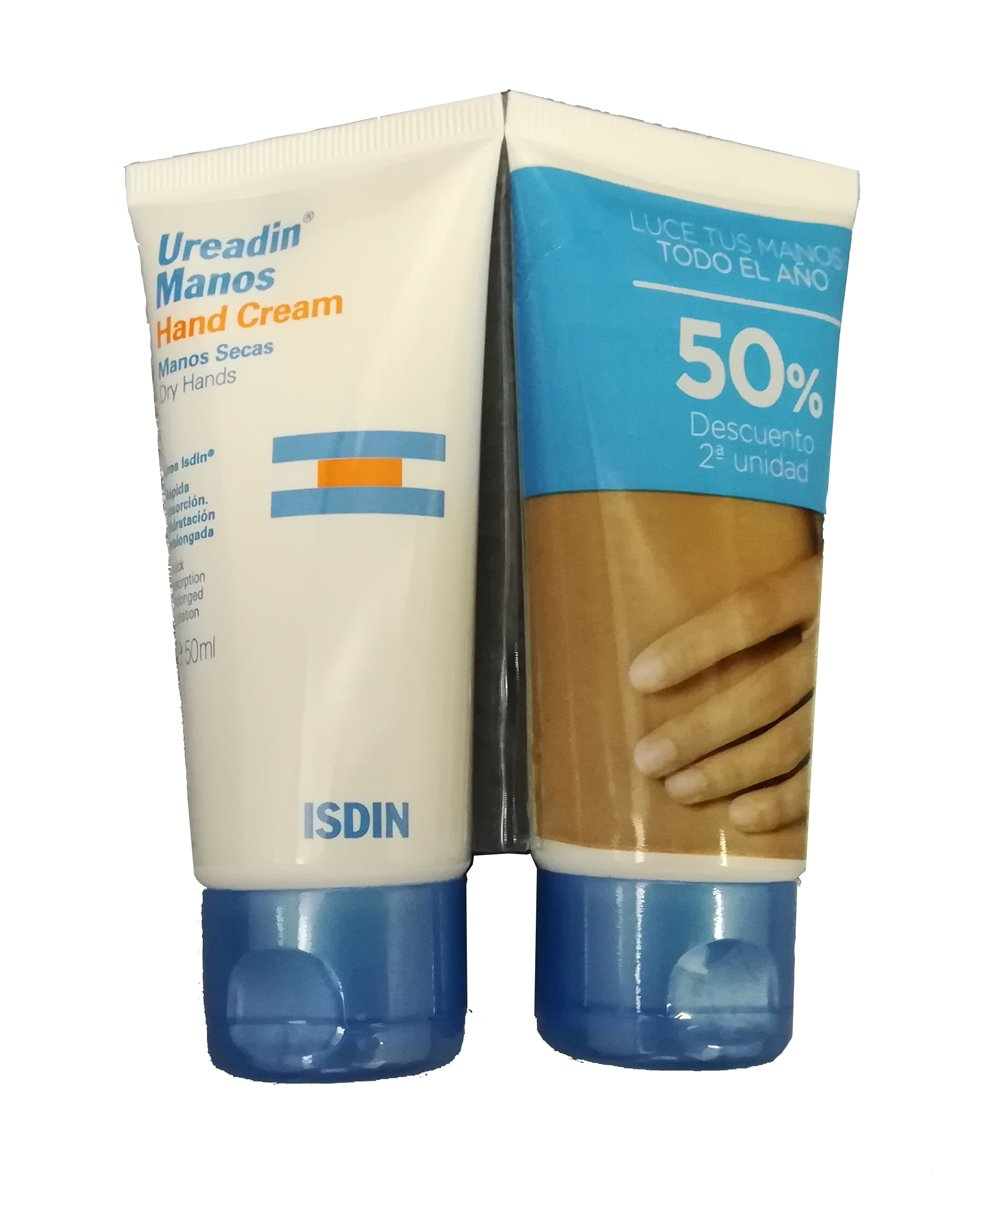 Ureadin duplo crema de manos 50ml+50ml ISDIN